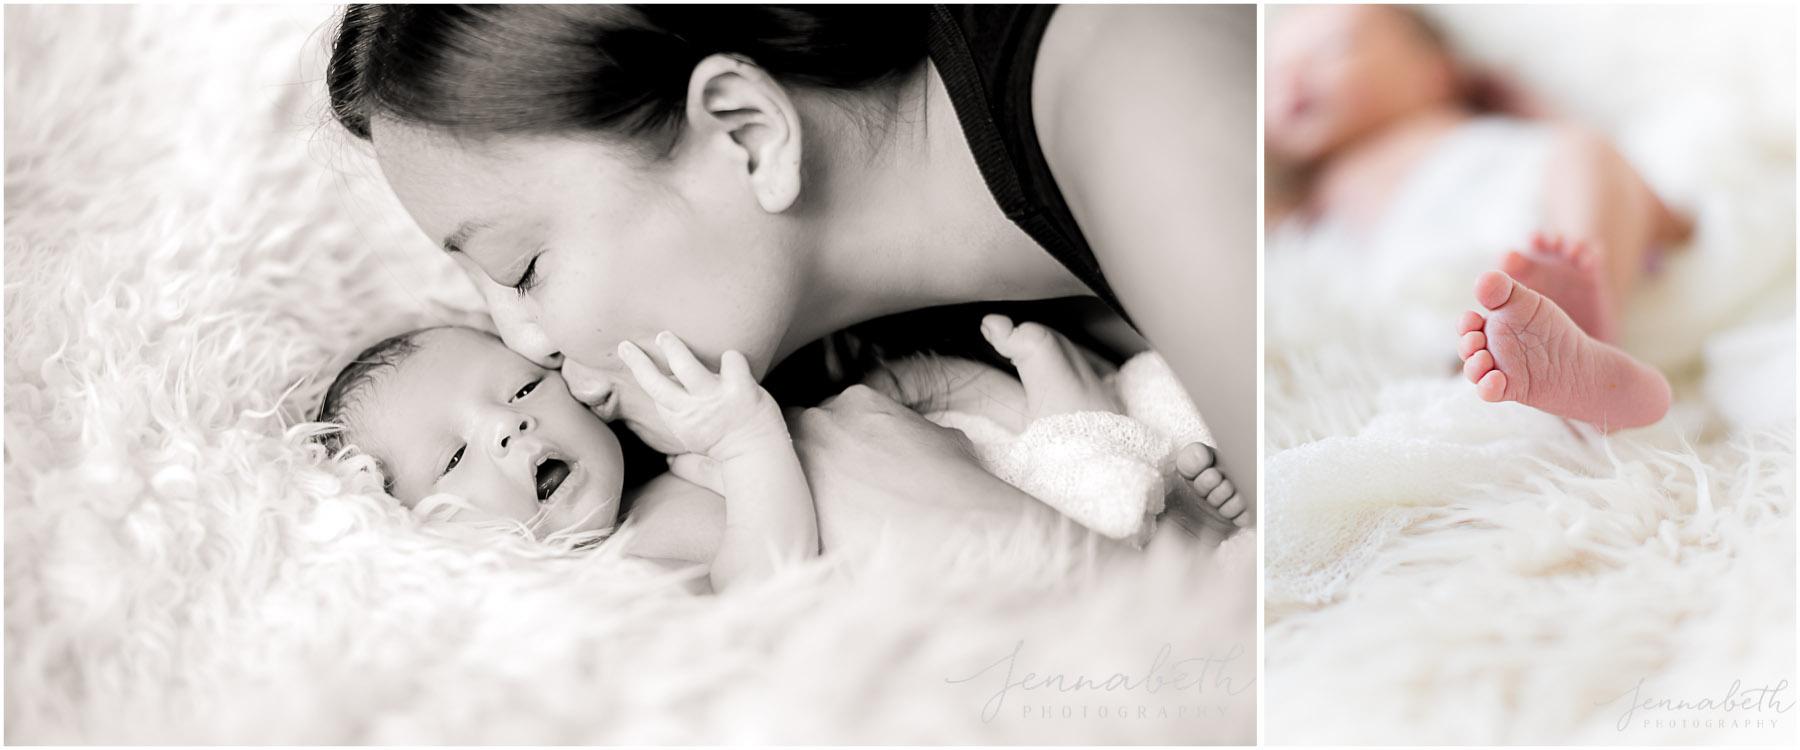 JennaBethPhotography-Quinlan-6.jpg